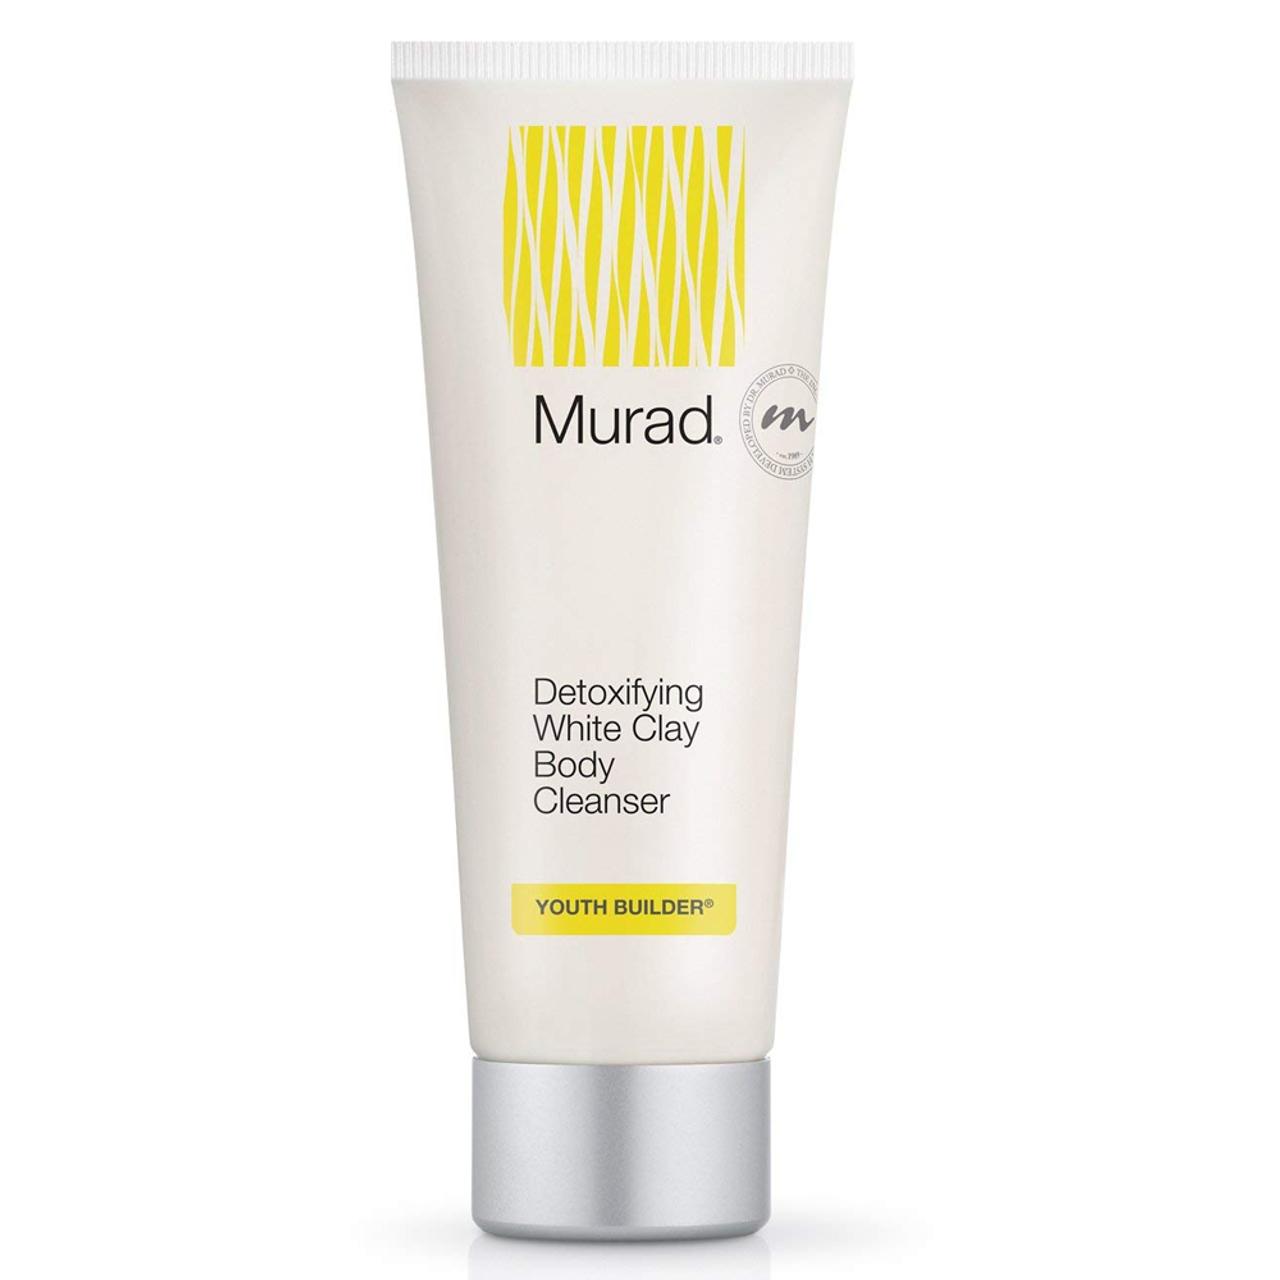 Murad Detoxifying White Clay Body Cleanser (discontinued) BeautifiedYou.com